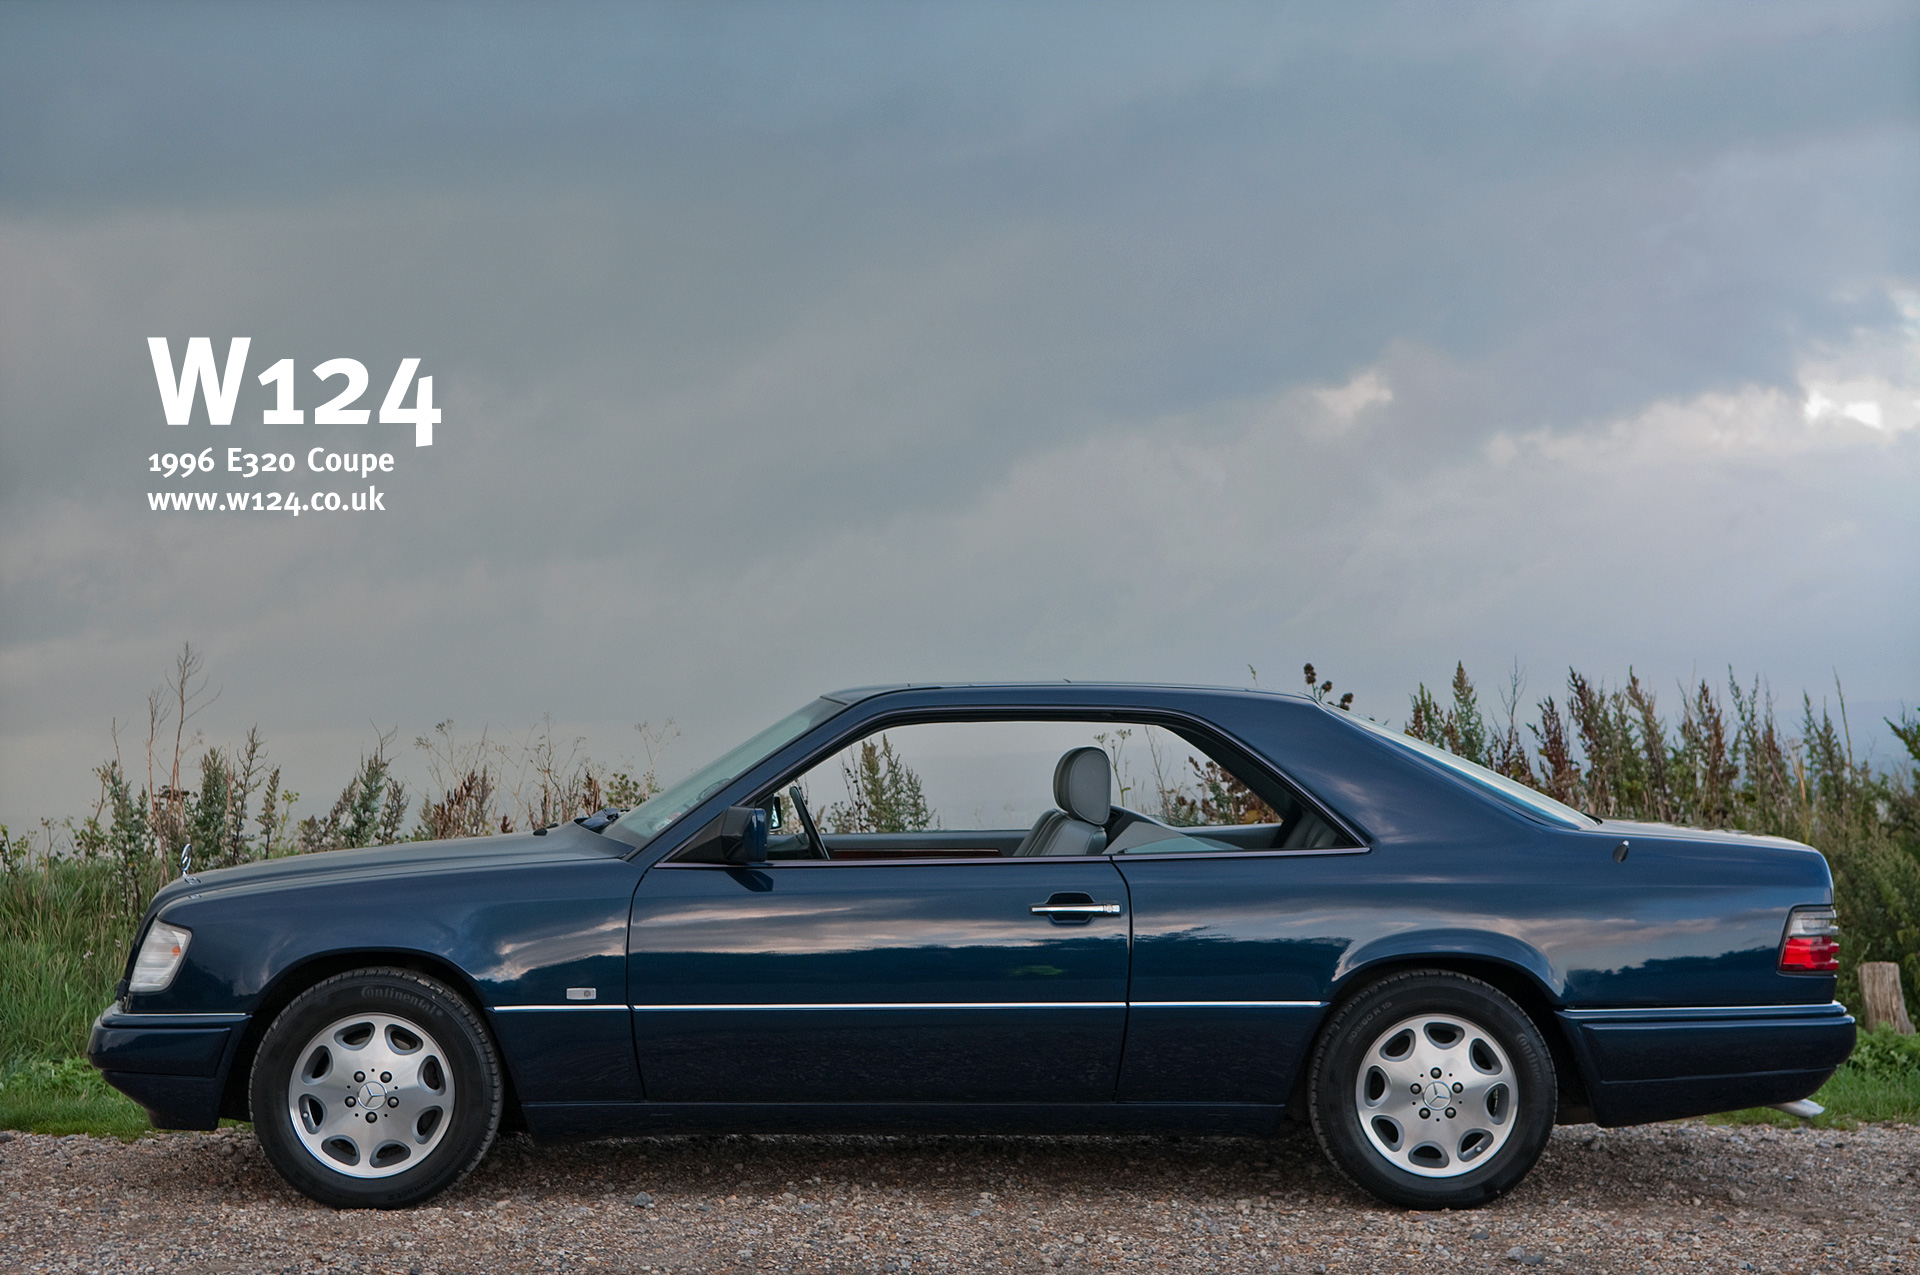 Mercedes-Benz E-klasse AMG I (W124) 1993 - 1996 Coupe-Hardtop #6